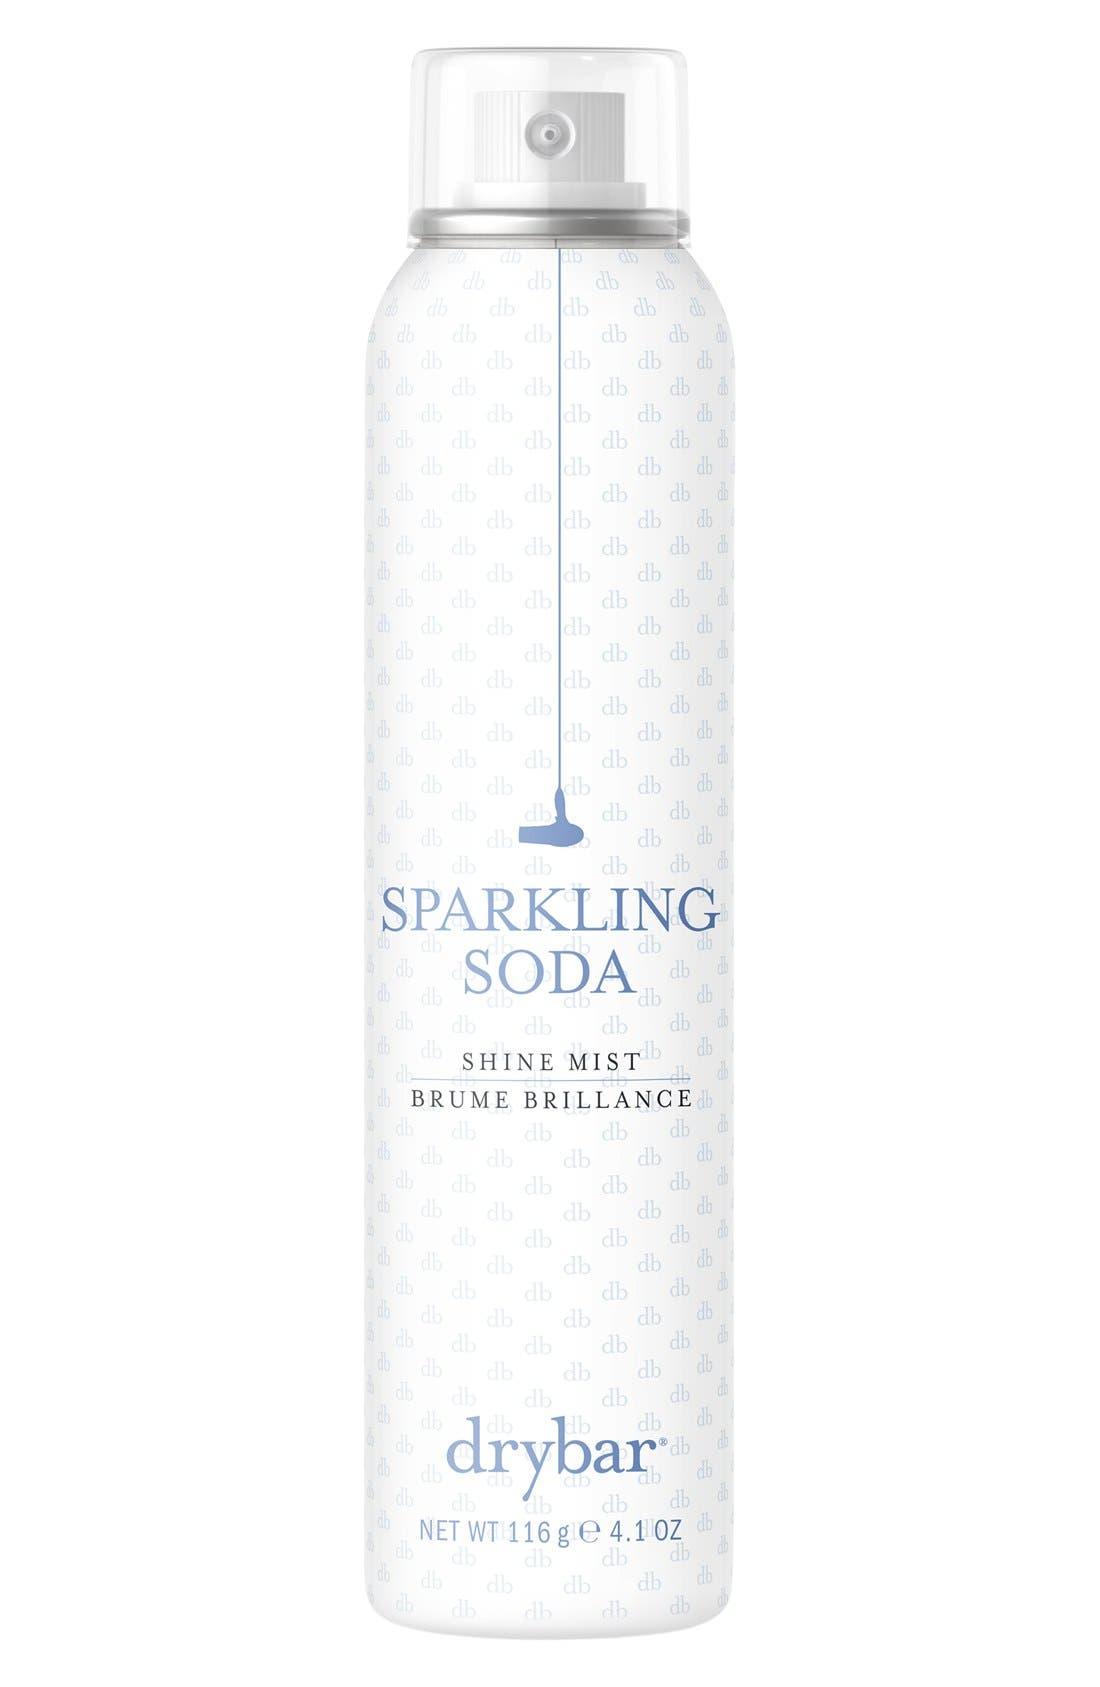 Drybar 'Sparkling Soda' Shine Mist